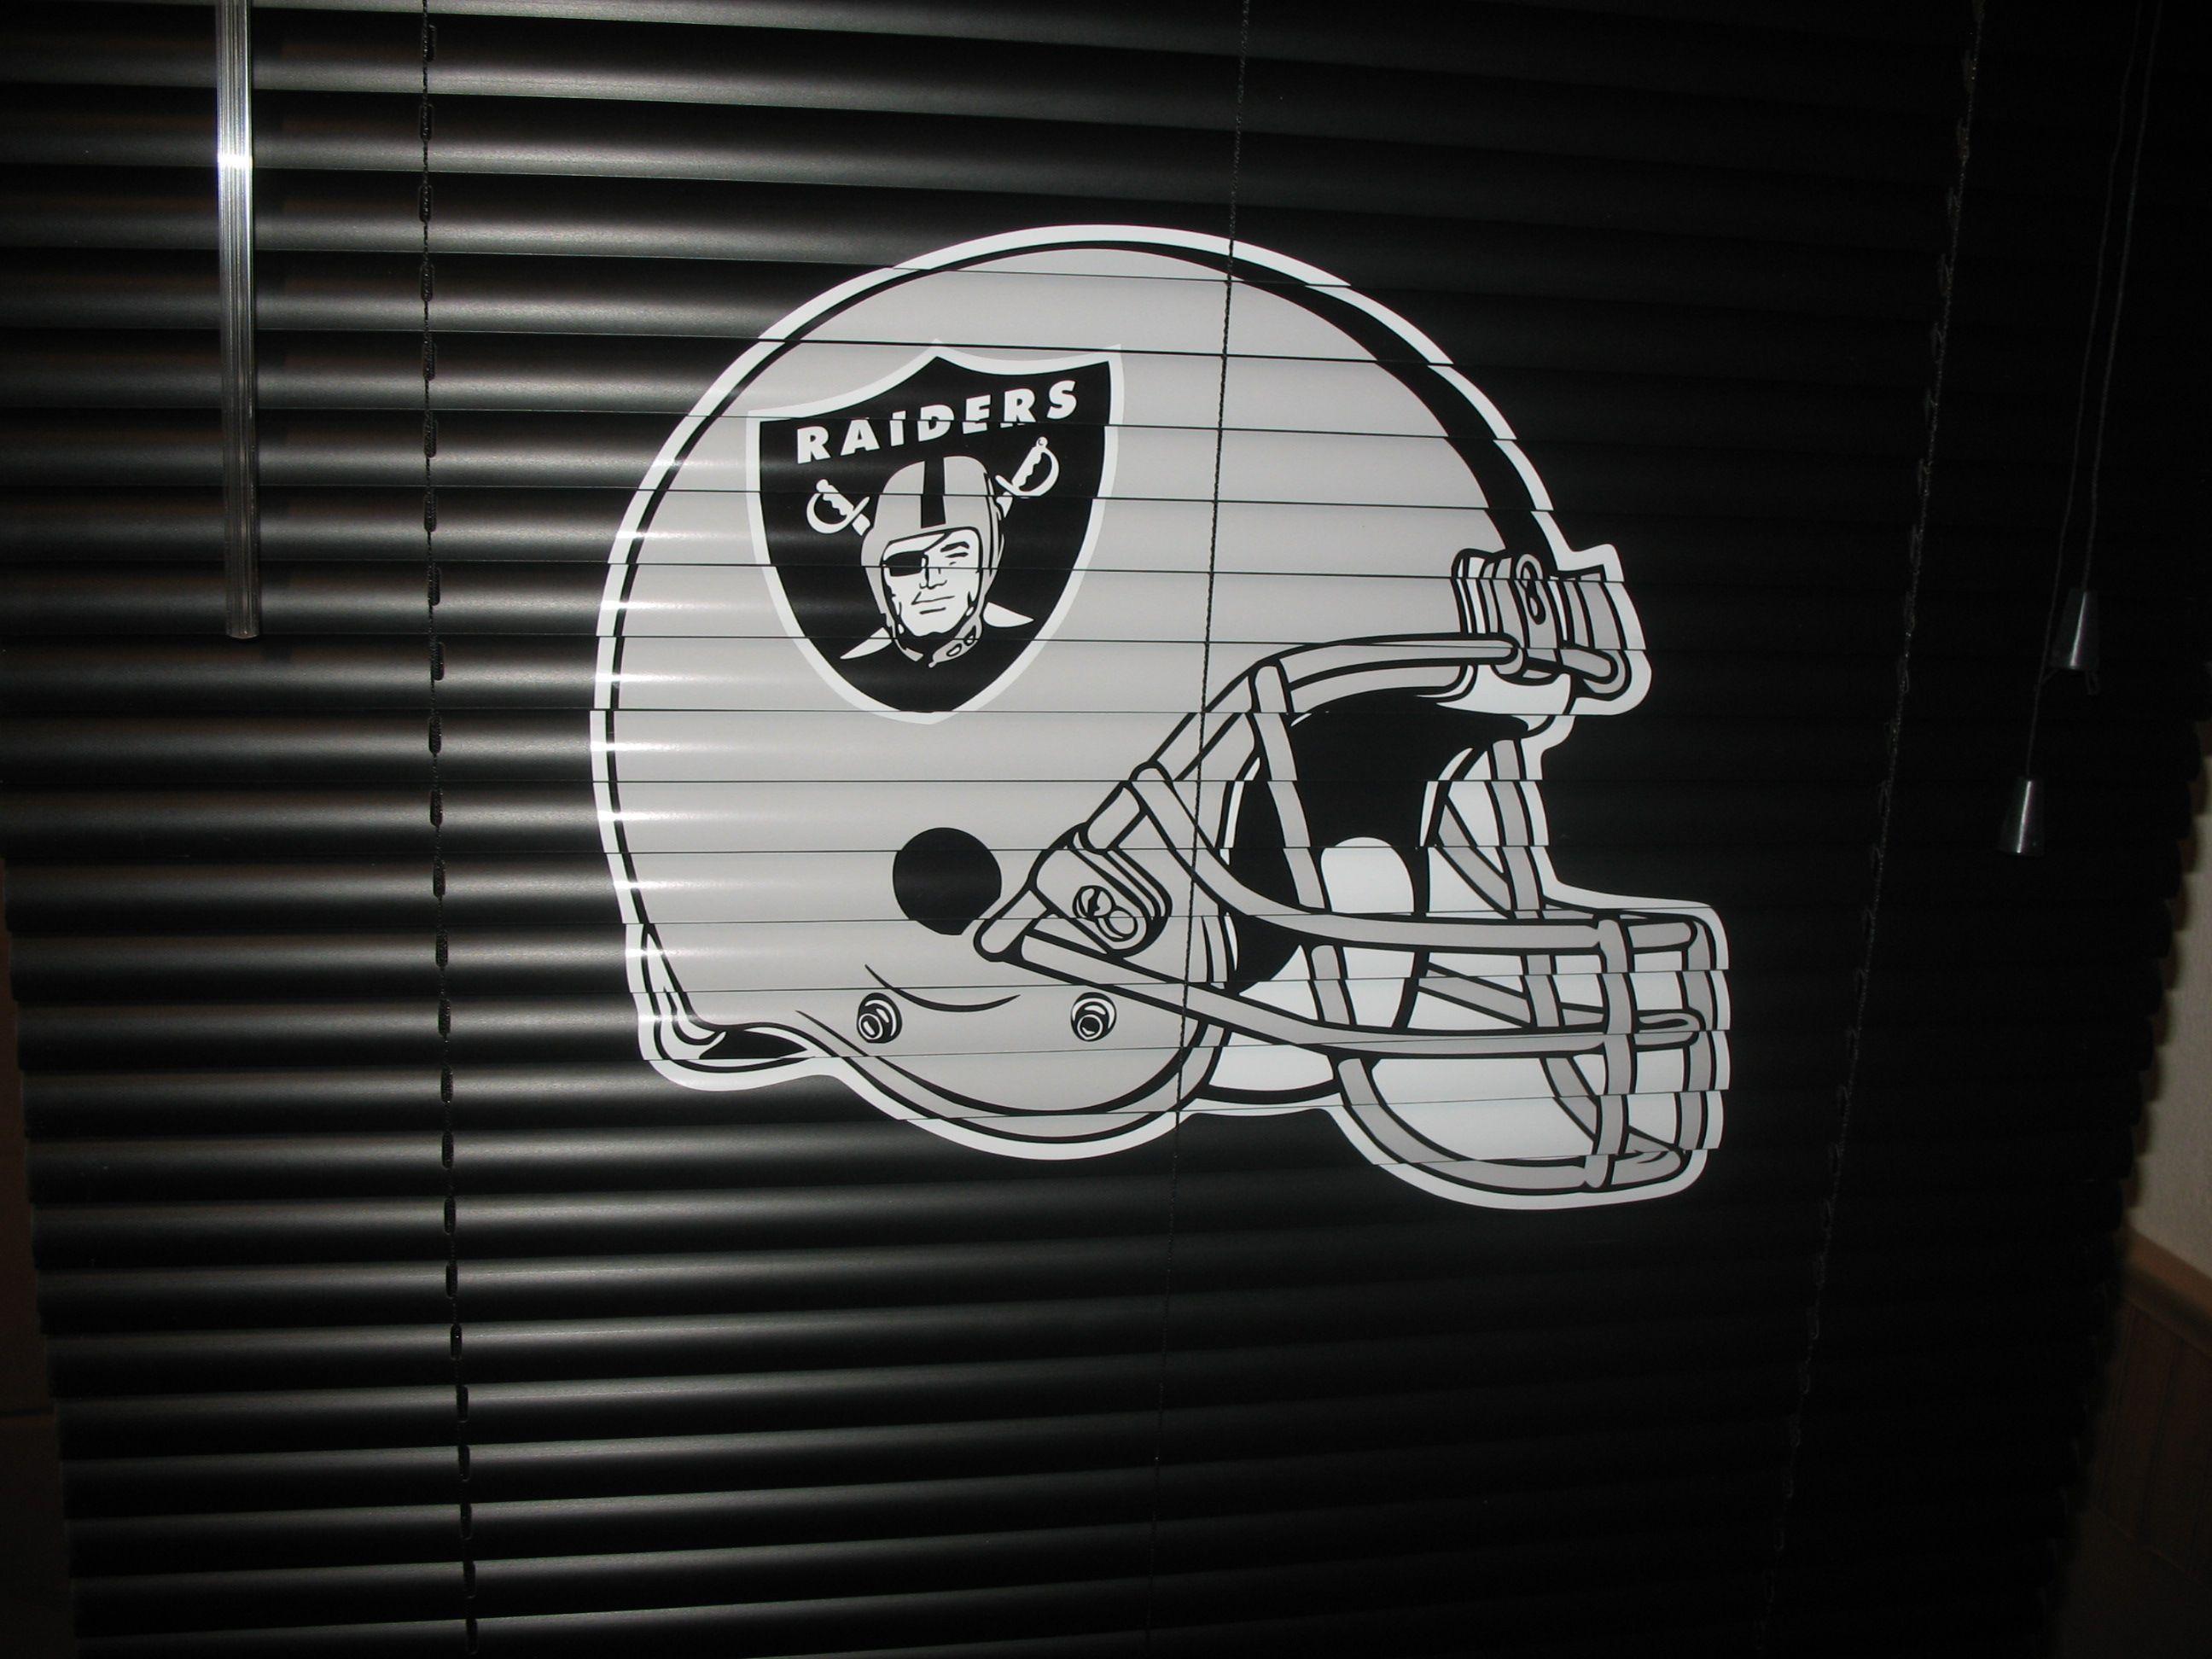 Oakland Raiders Man Cave Ideas : Raiders blinds man cave caven pinterest